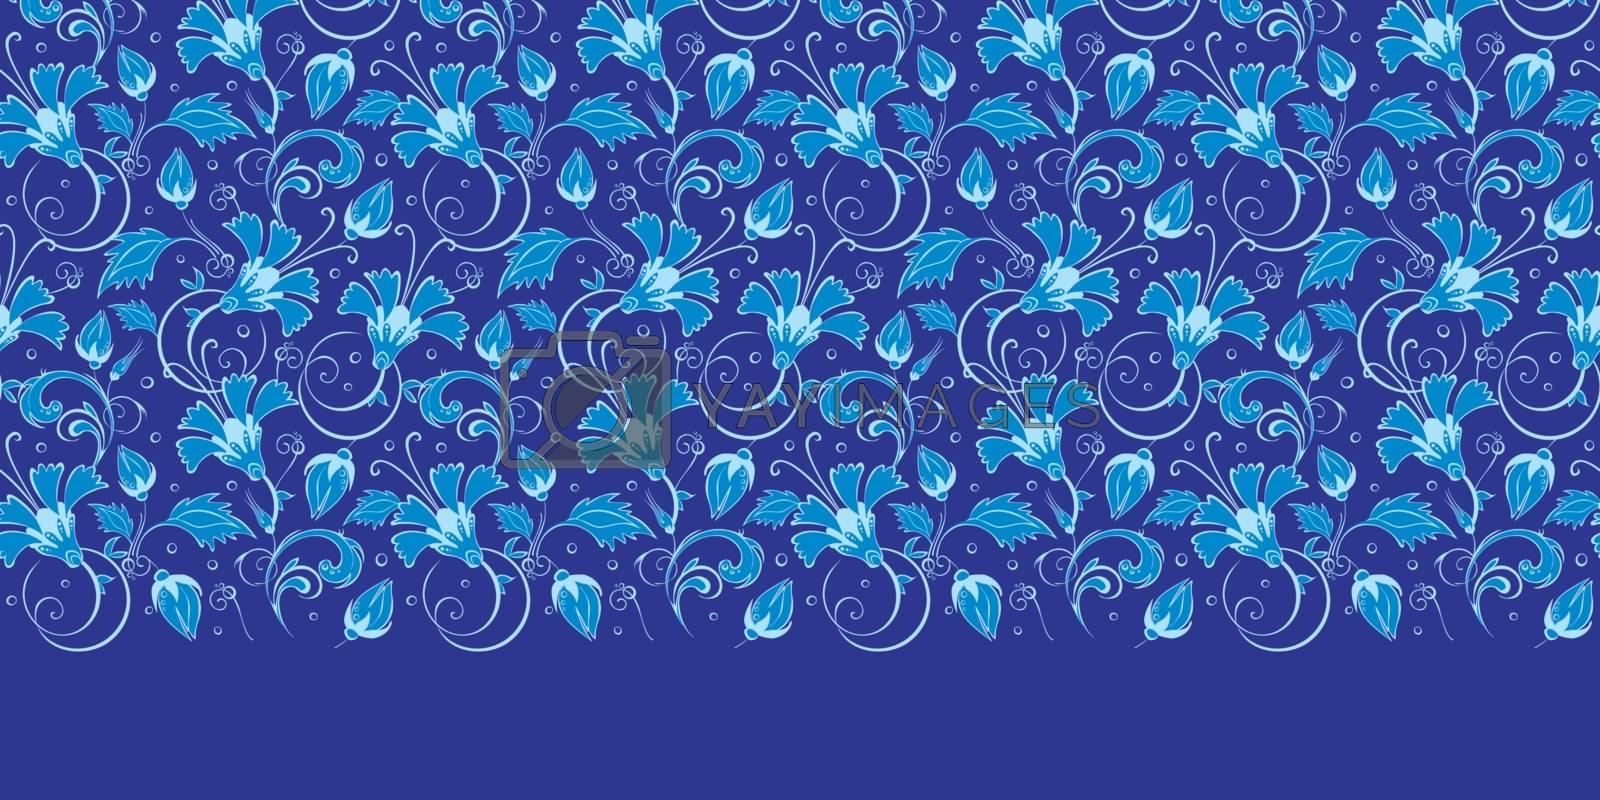 Royalty free image of Vector dark blue turkish floral horizontal border seamless patte by Oksancia